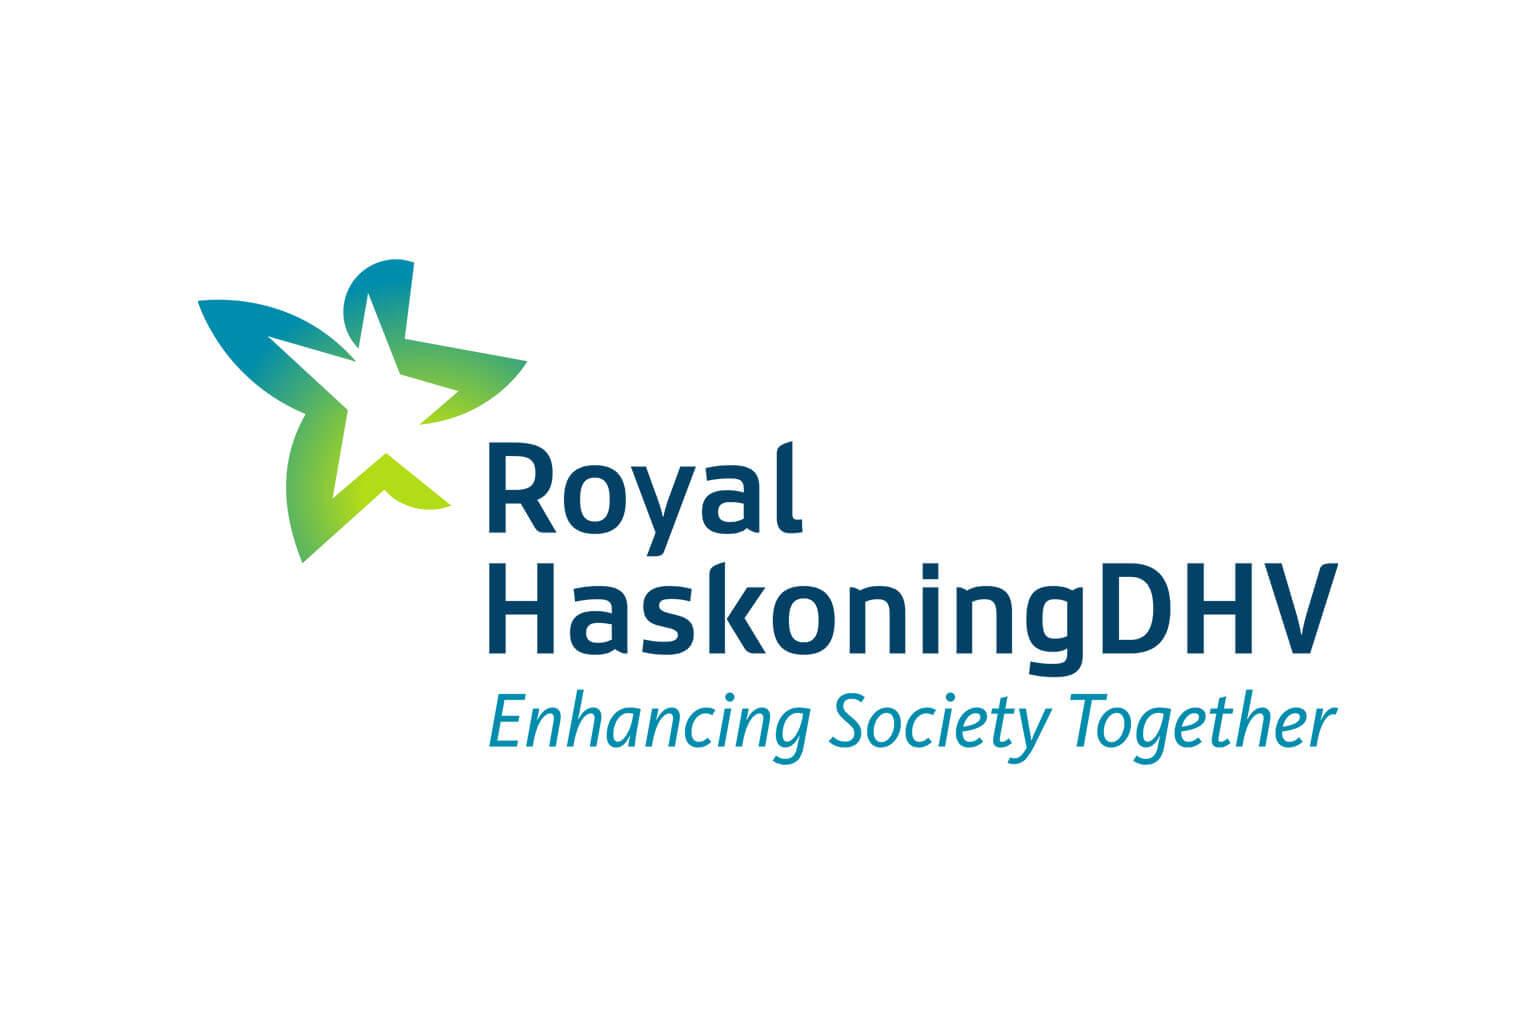 royal-haskoning-dhv